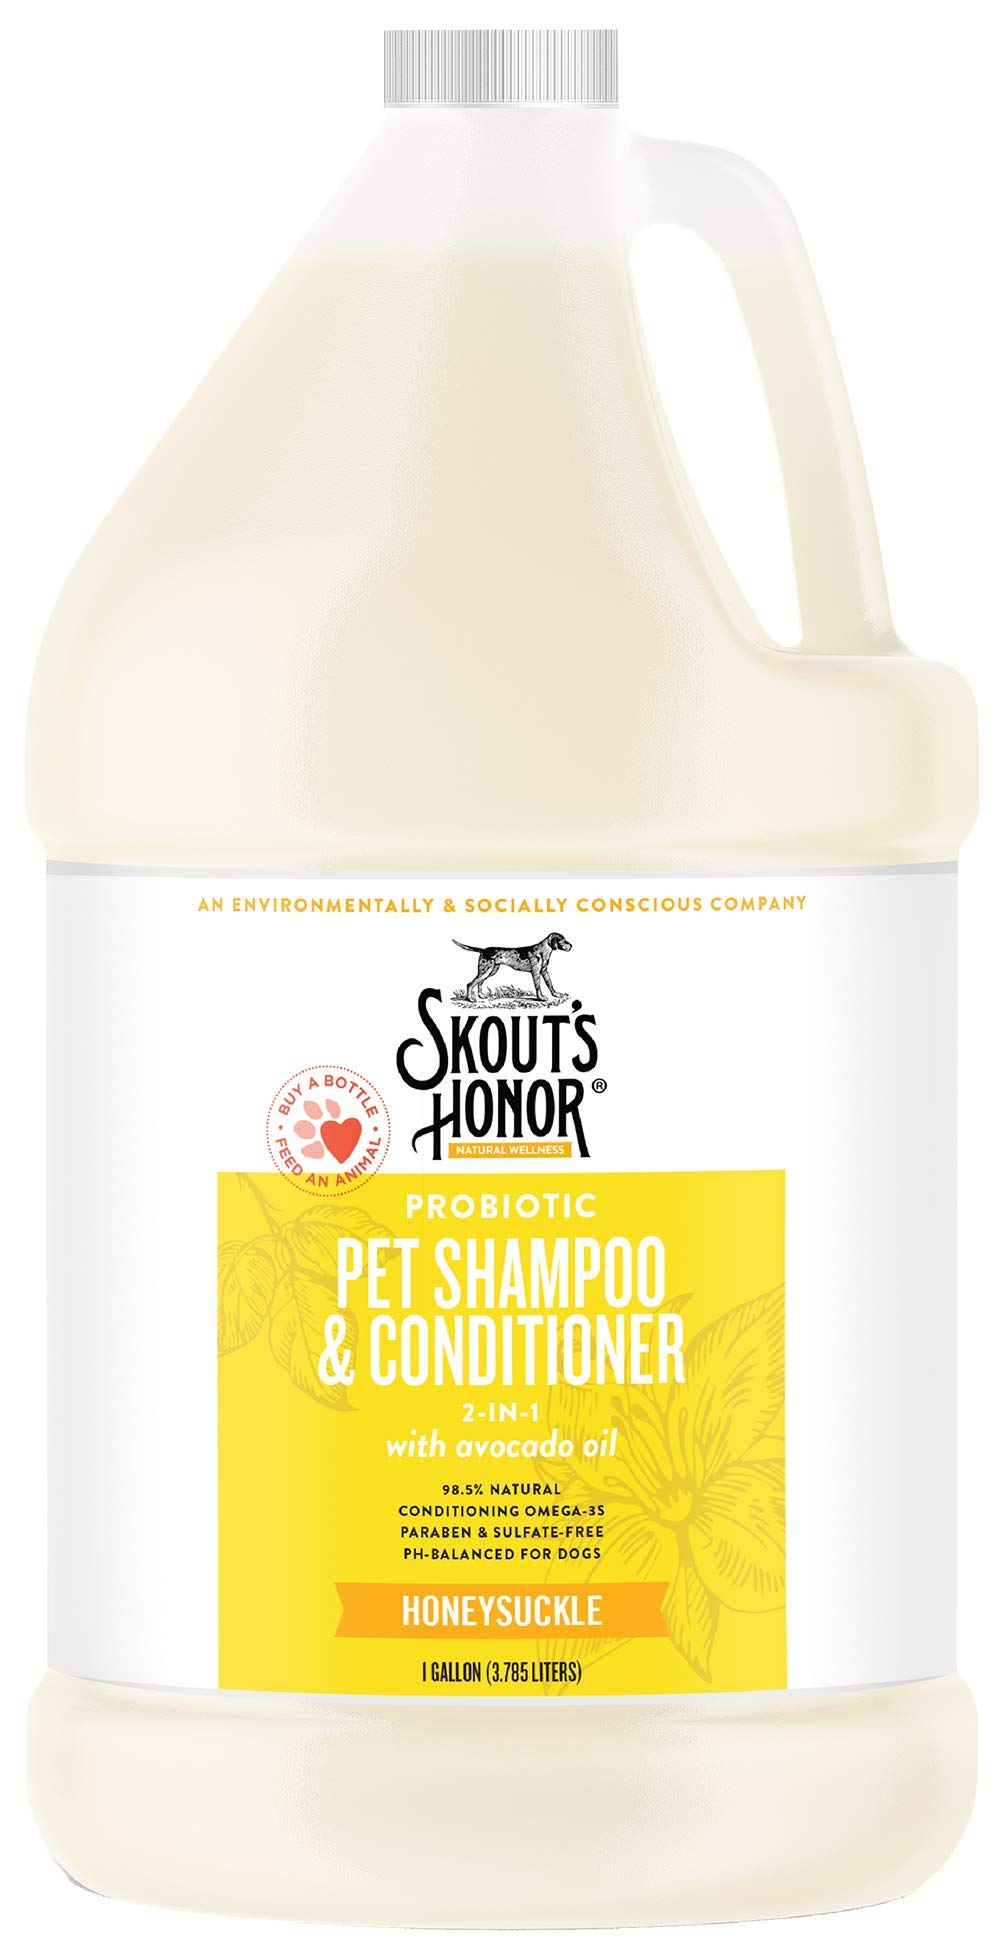 SKOUT'S HONOR Probiotic Pet Shampoo & Conditioner (2-in-1) - 1 Gallon